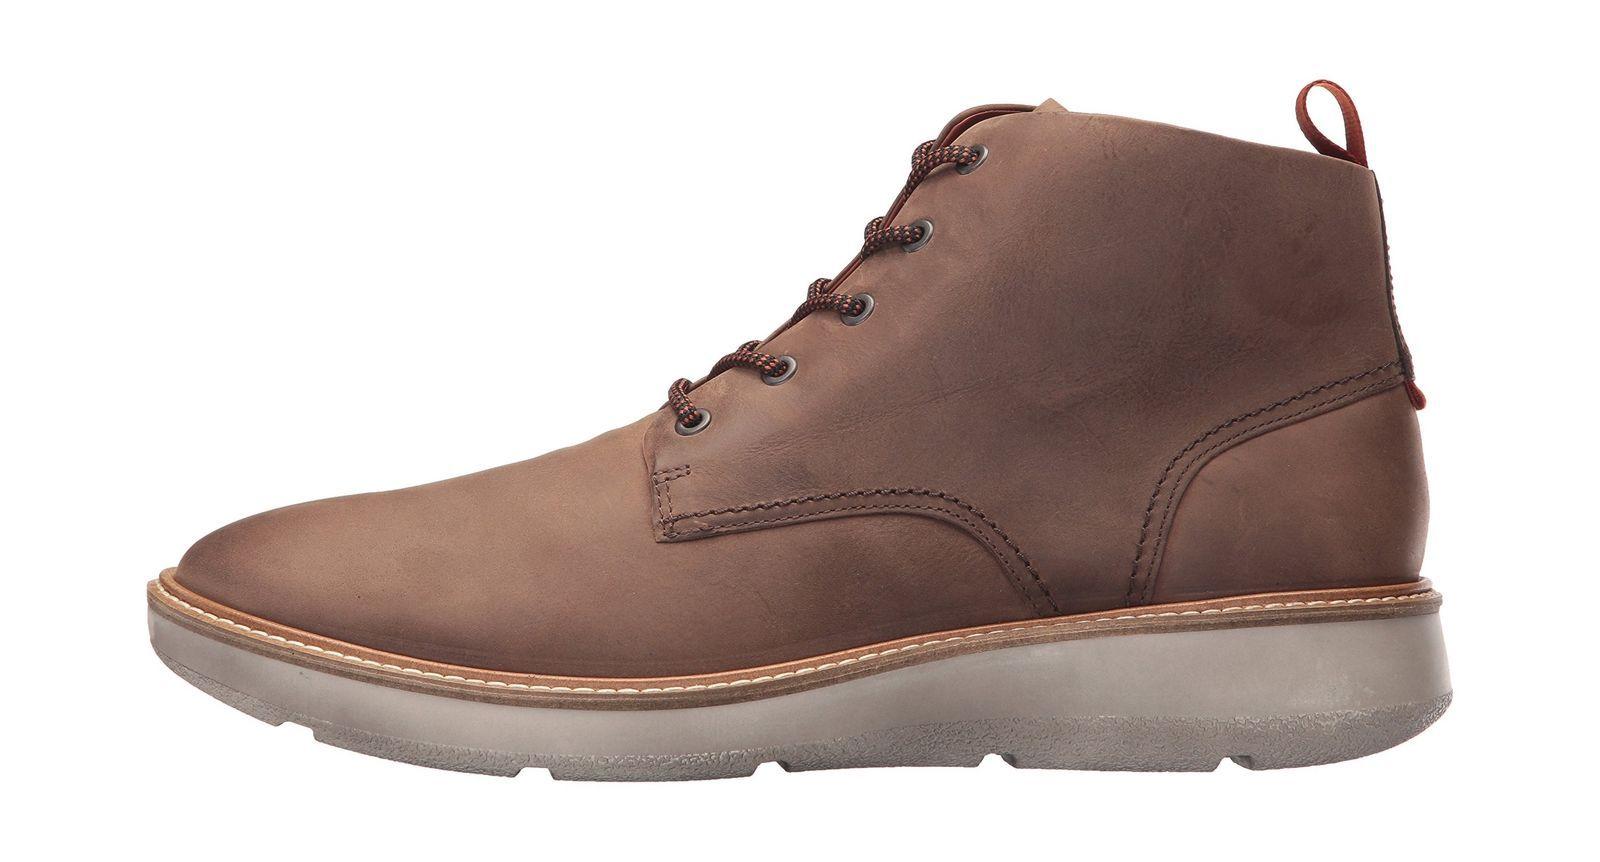 Ecco Whistler, Chaussures Multisport Outdoor Homme, Marron (Brandy/Brandy), 44 EU